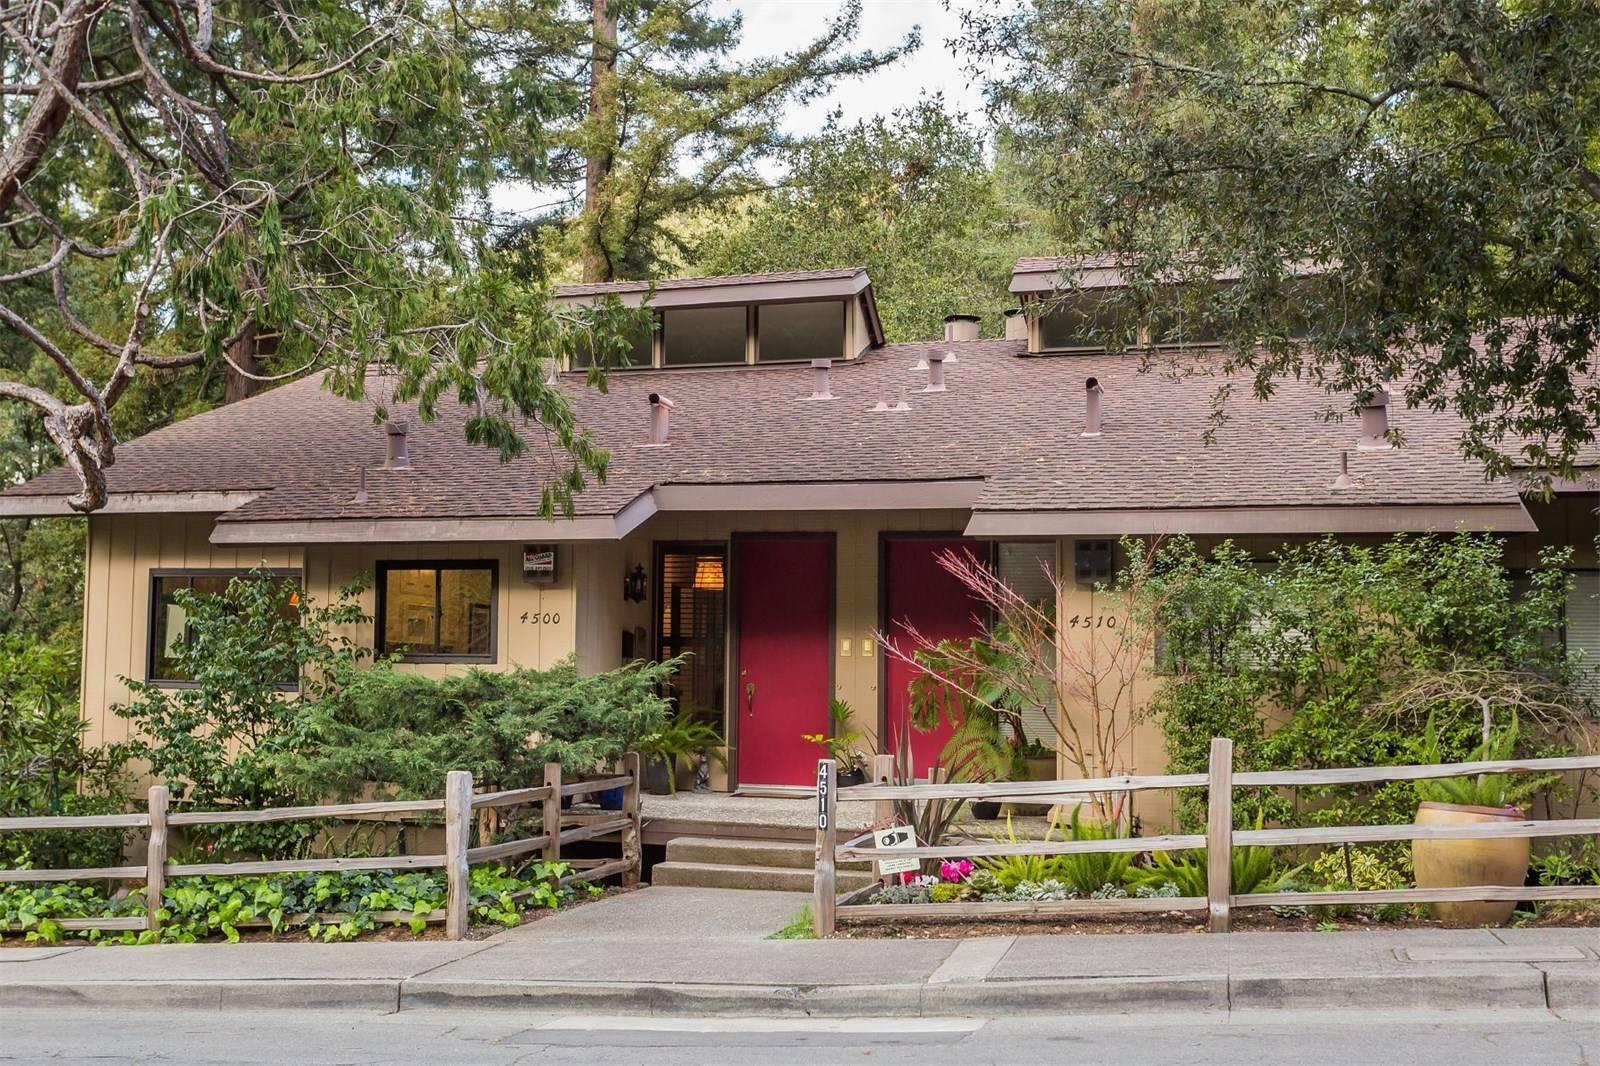 4500 Clarewood Drive, Oakland, CA 94618 Michael Thompson, Realtor